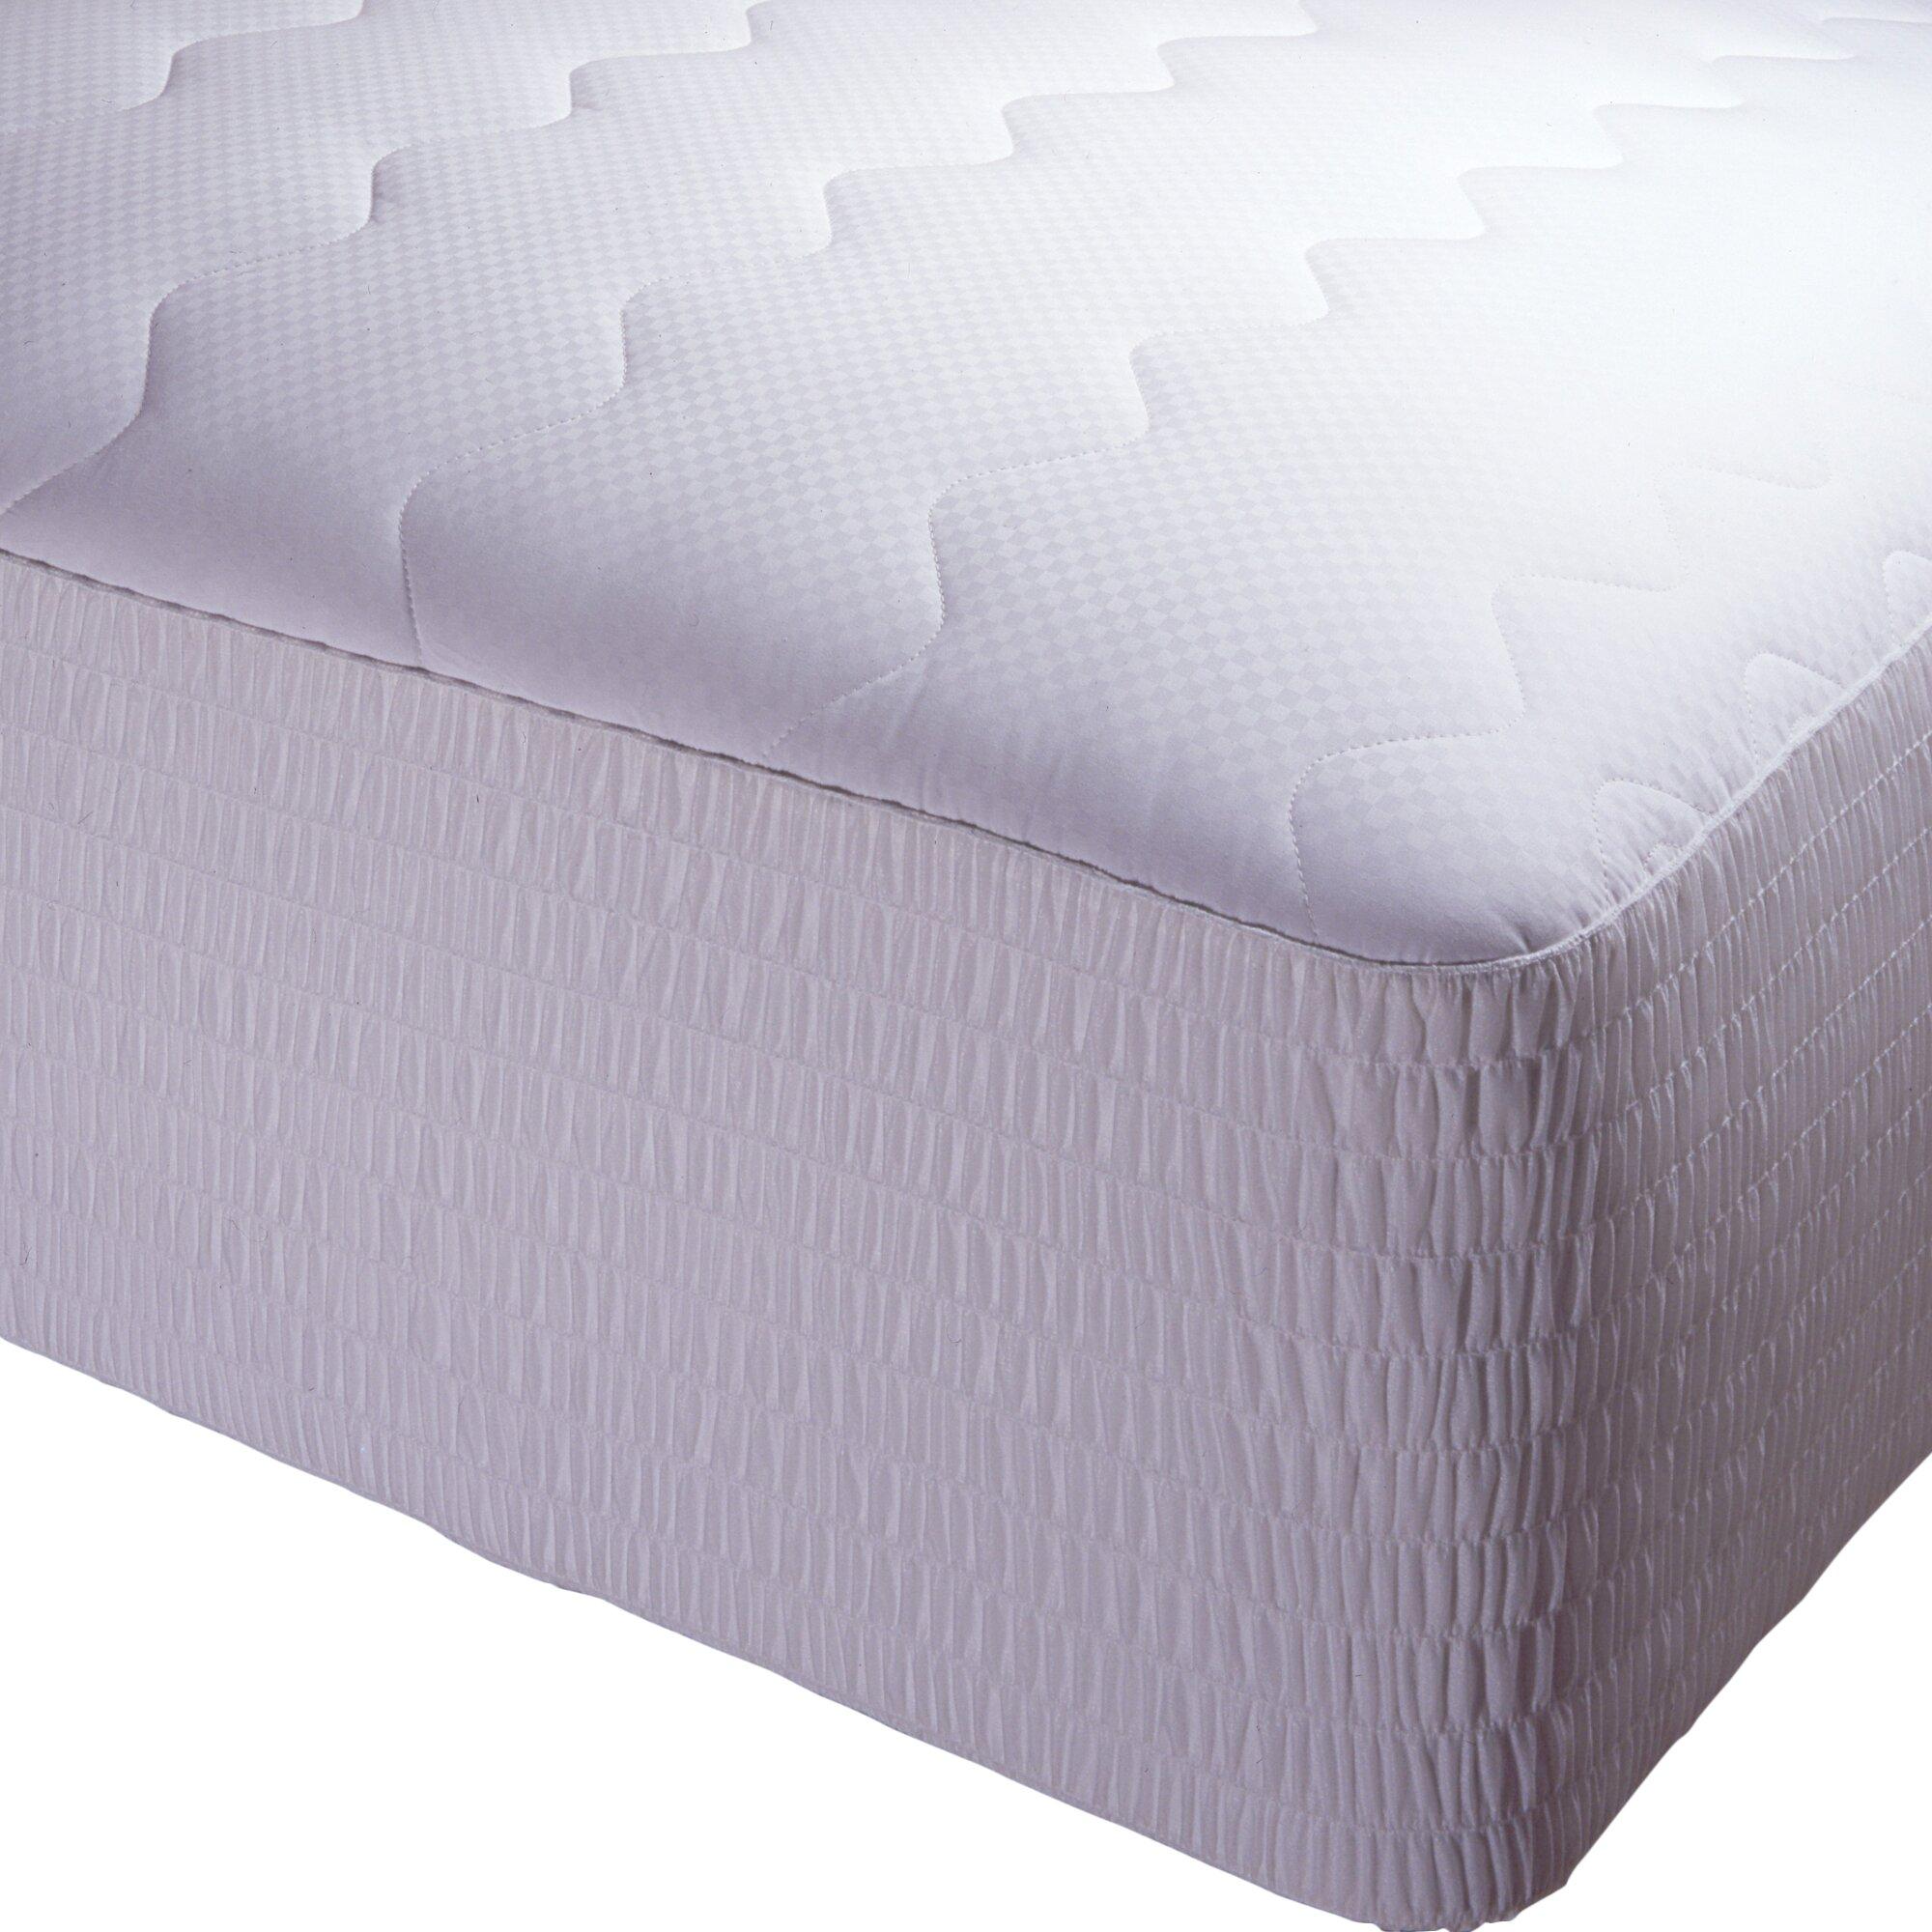 Croscill 100% Cotton Mattress Pad & Reviews